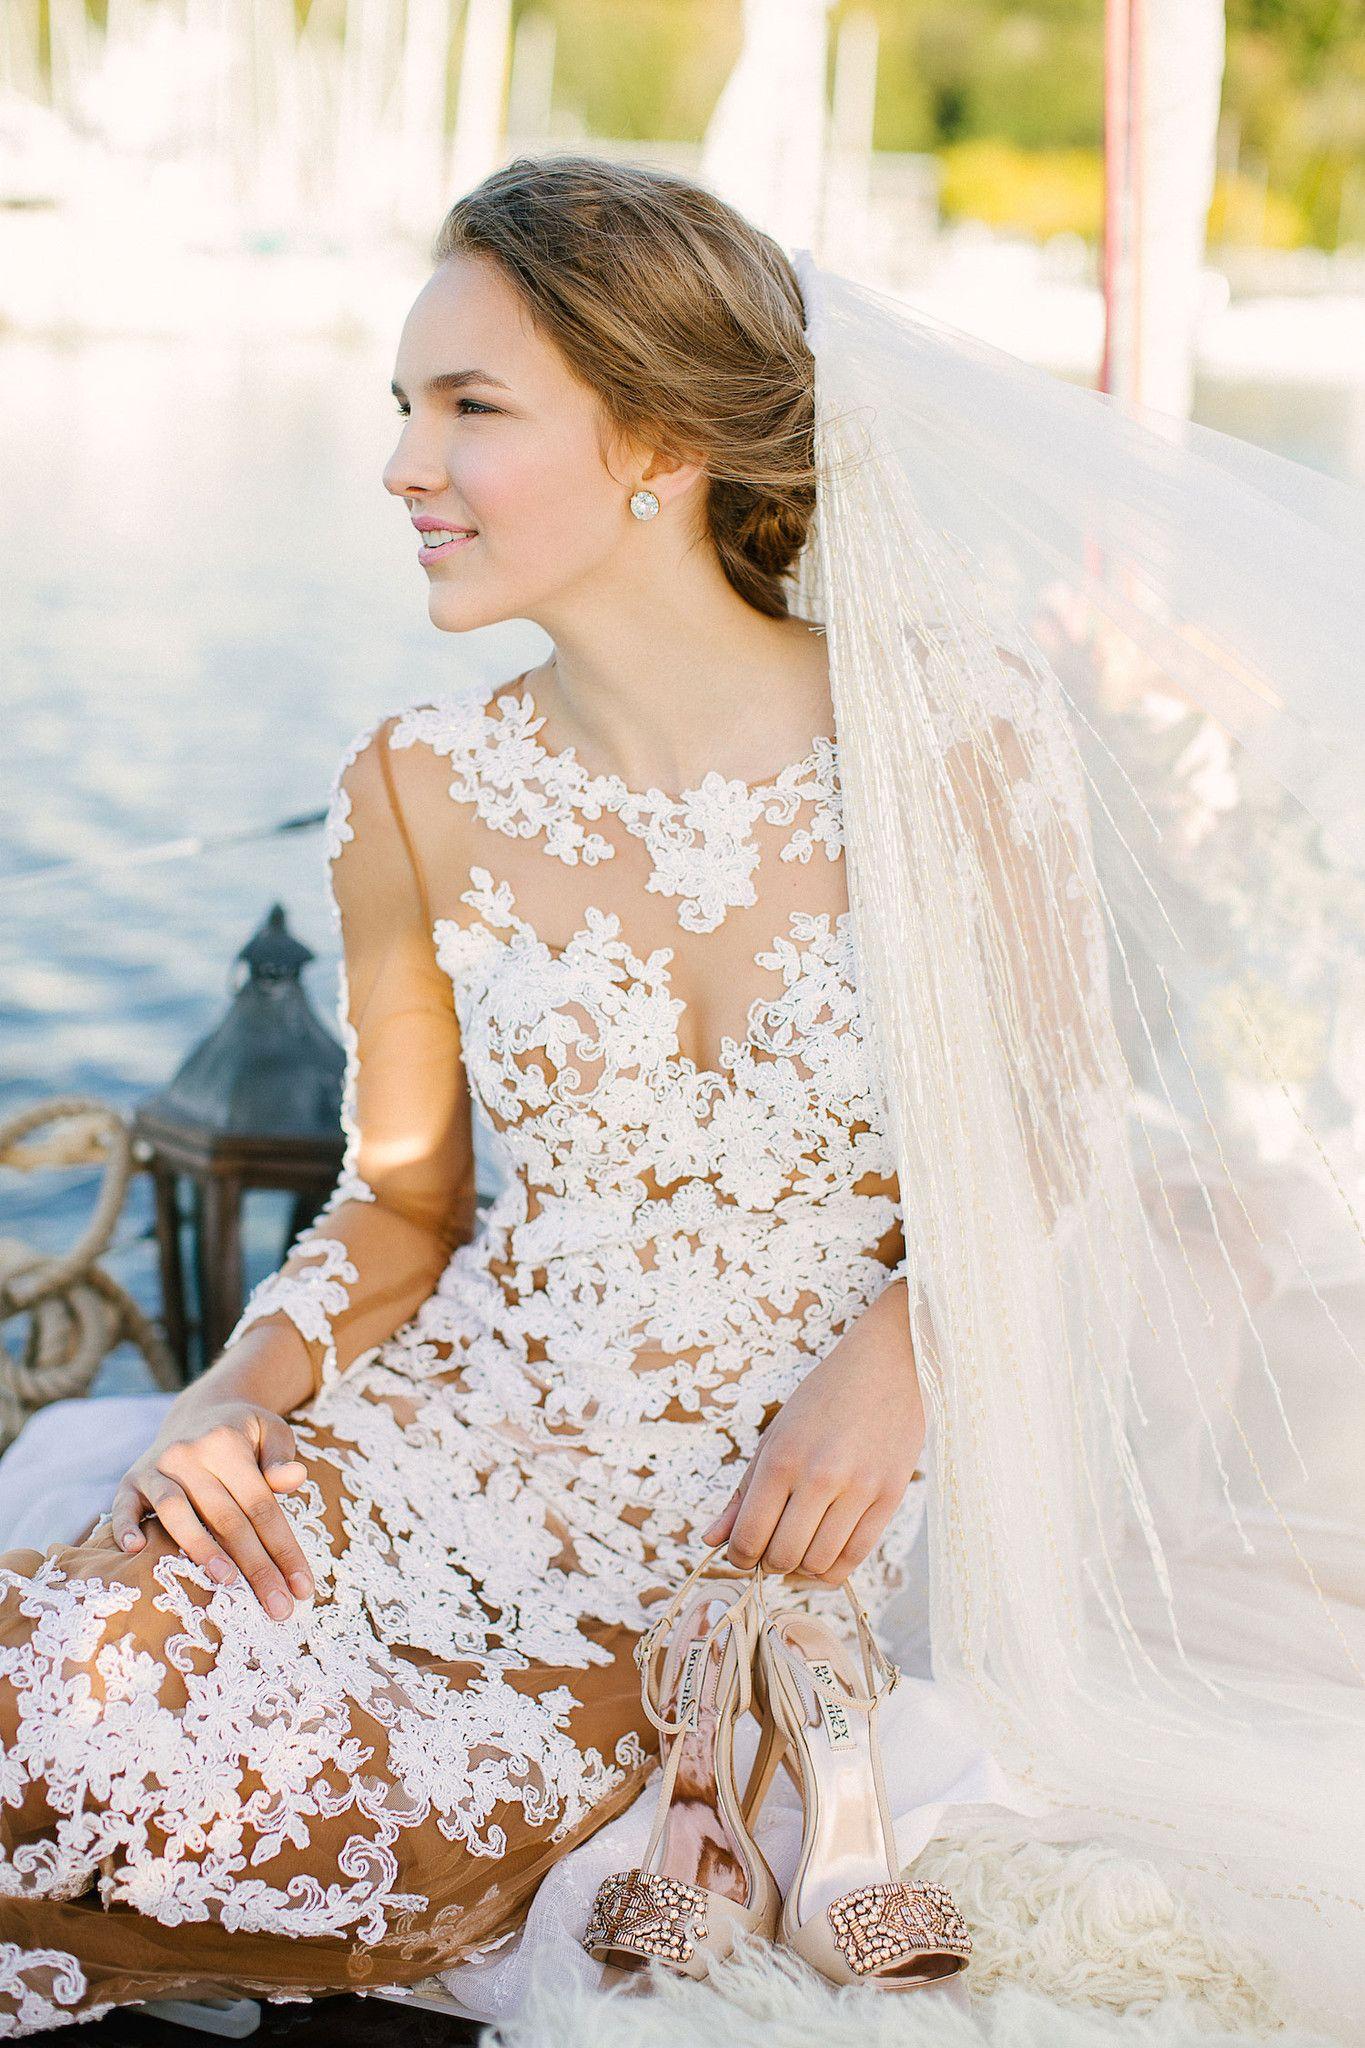 Non traditional wedding dress  Non Traditional Wedding Dress Nude Sheath Dress Lucy  Dream